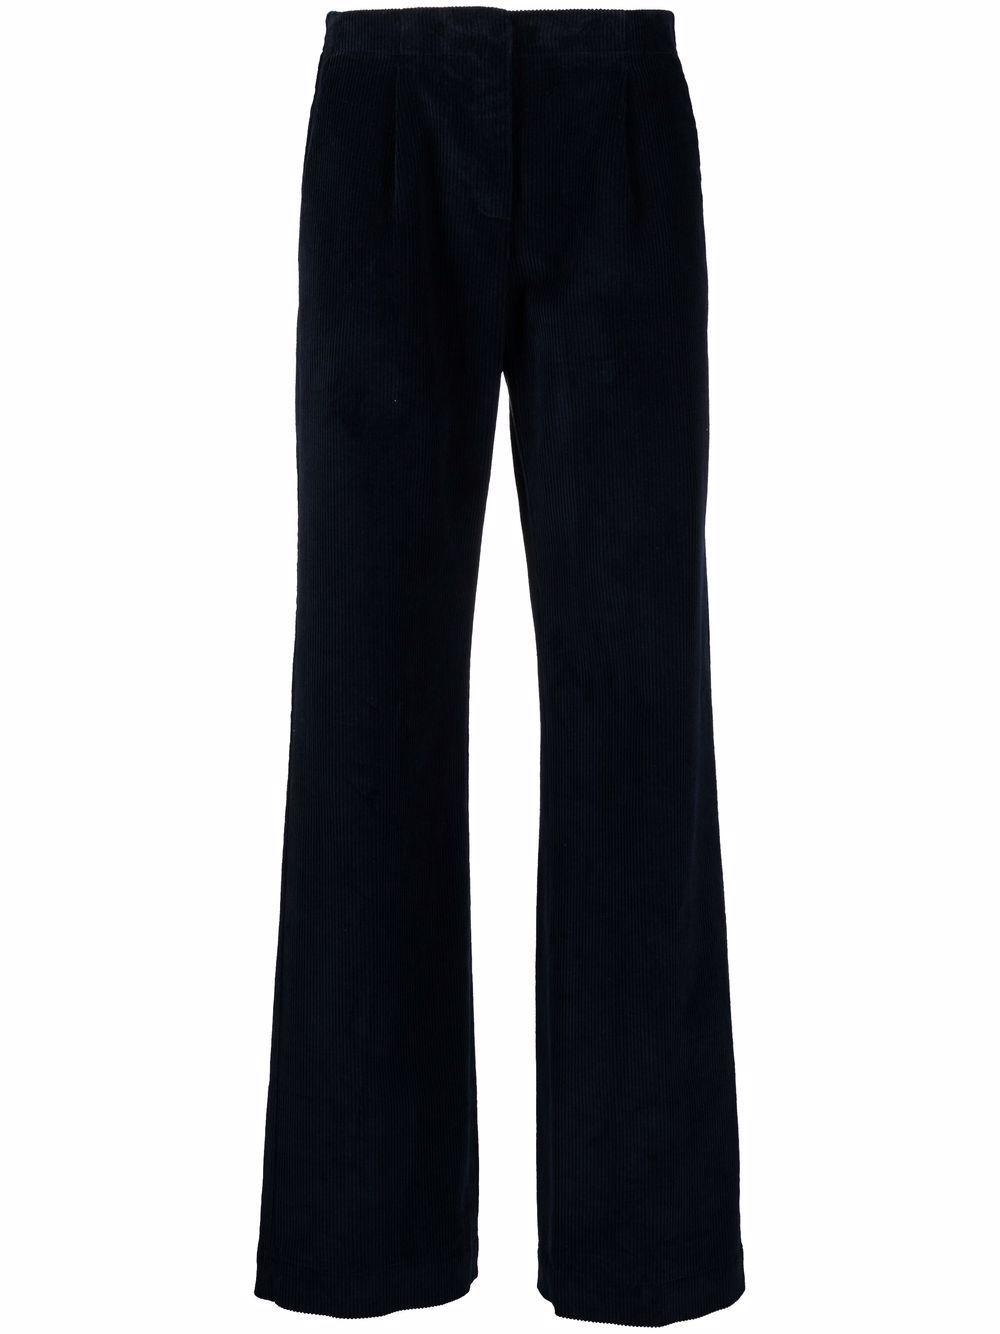 Pantalone elise in cotone